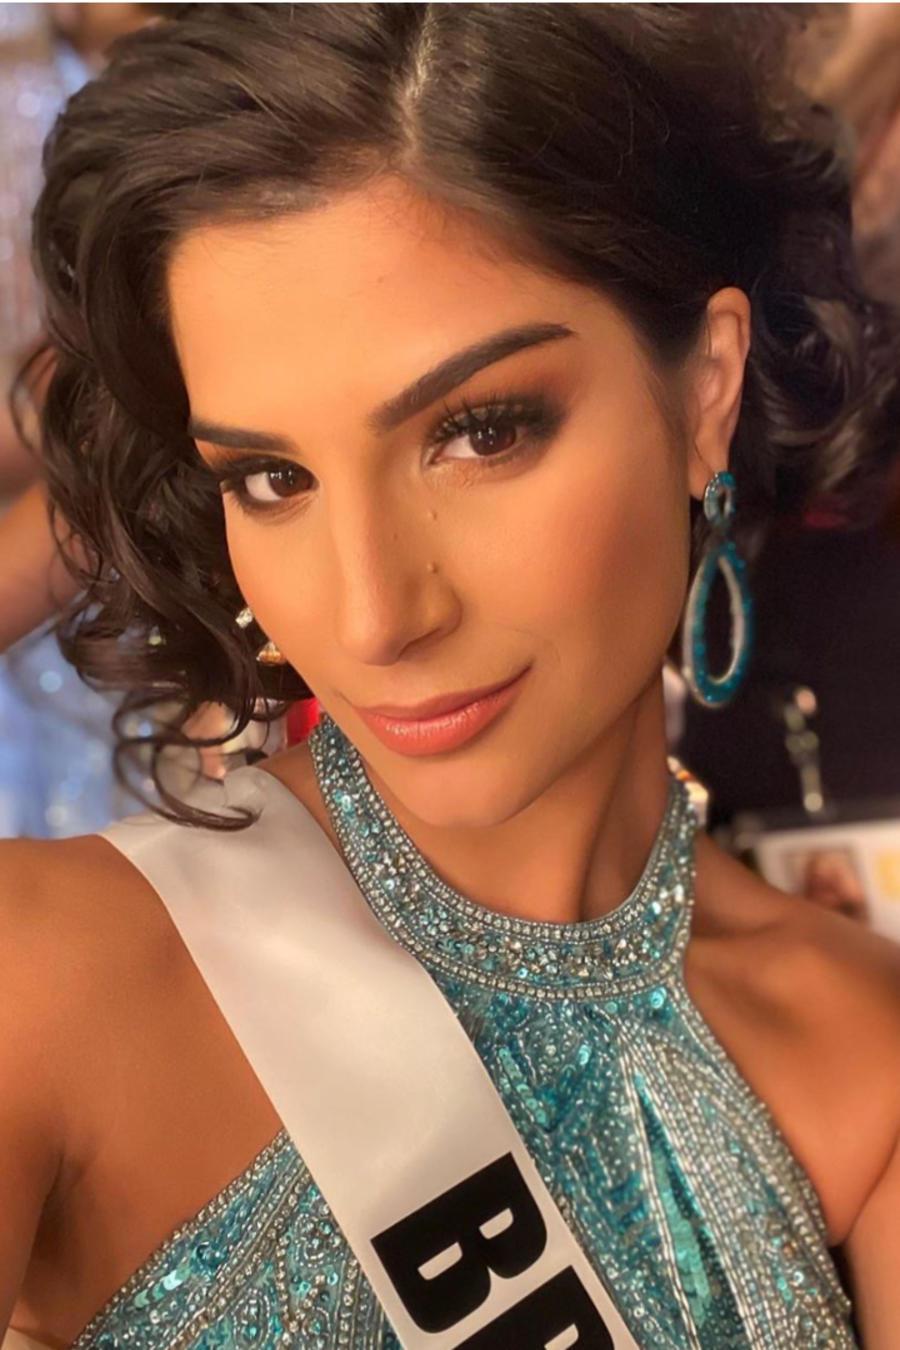 Júlia Horta, Mis Brasil 2019 y Vichitta Phonevilay, Miss Laos 2019